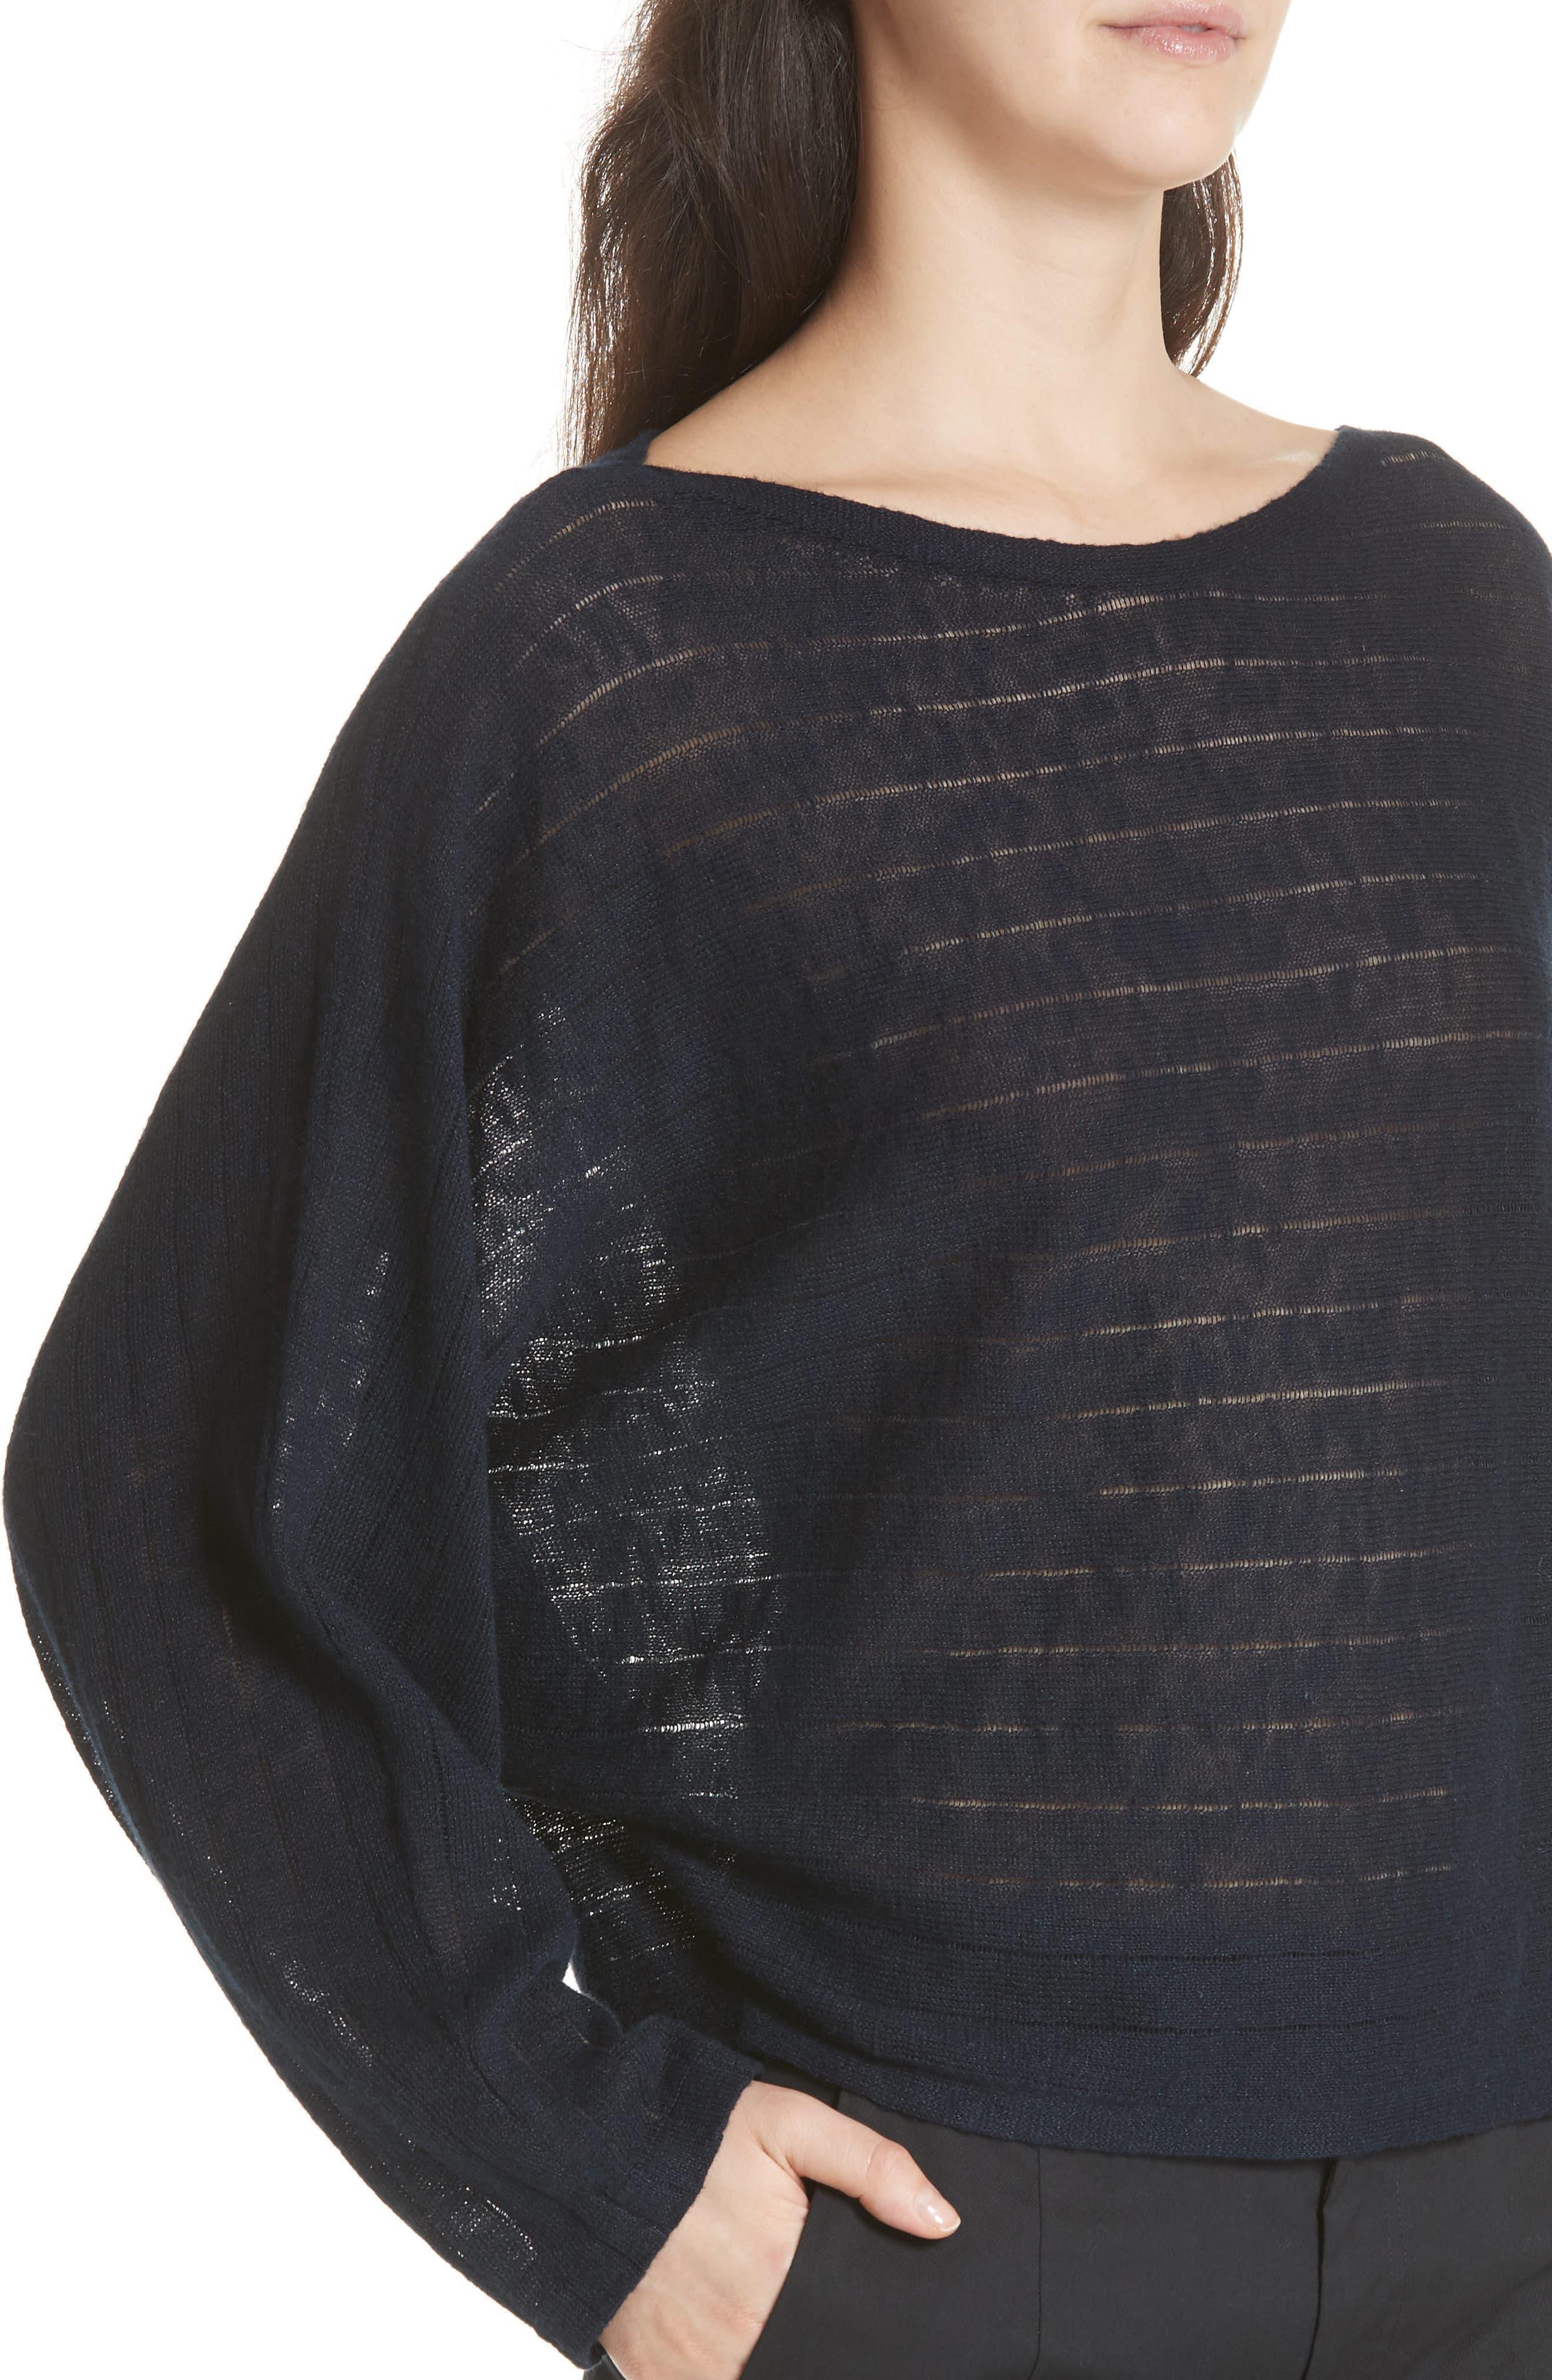 Ramie Cotton Sweater,                             Alternate thumbnail 4, color,                             306